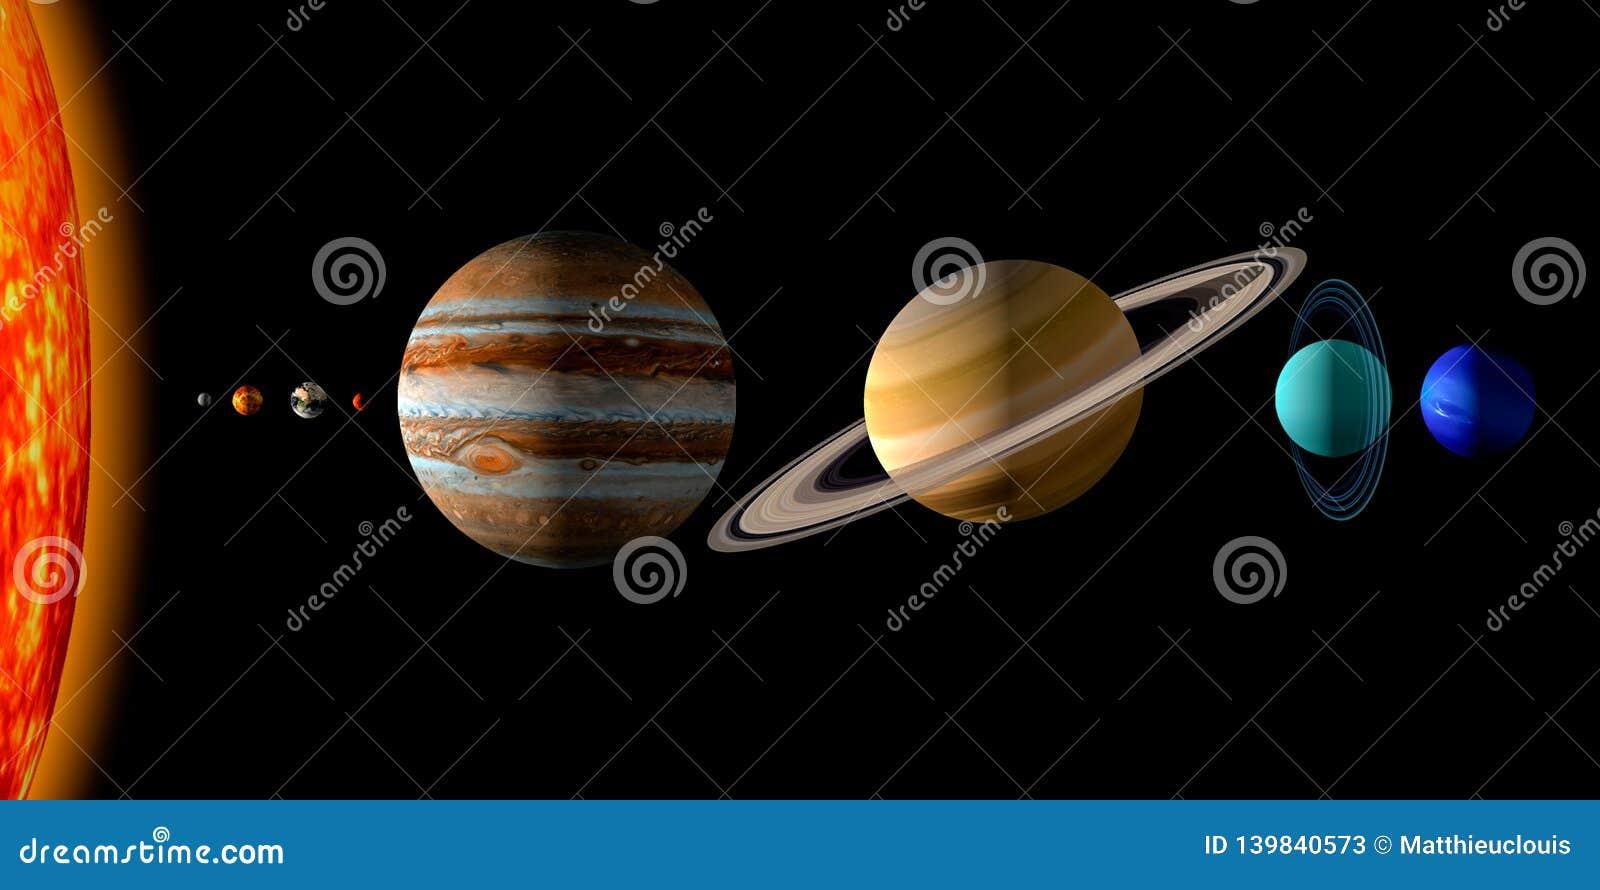 three planets aligned - 1300×740